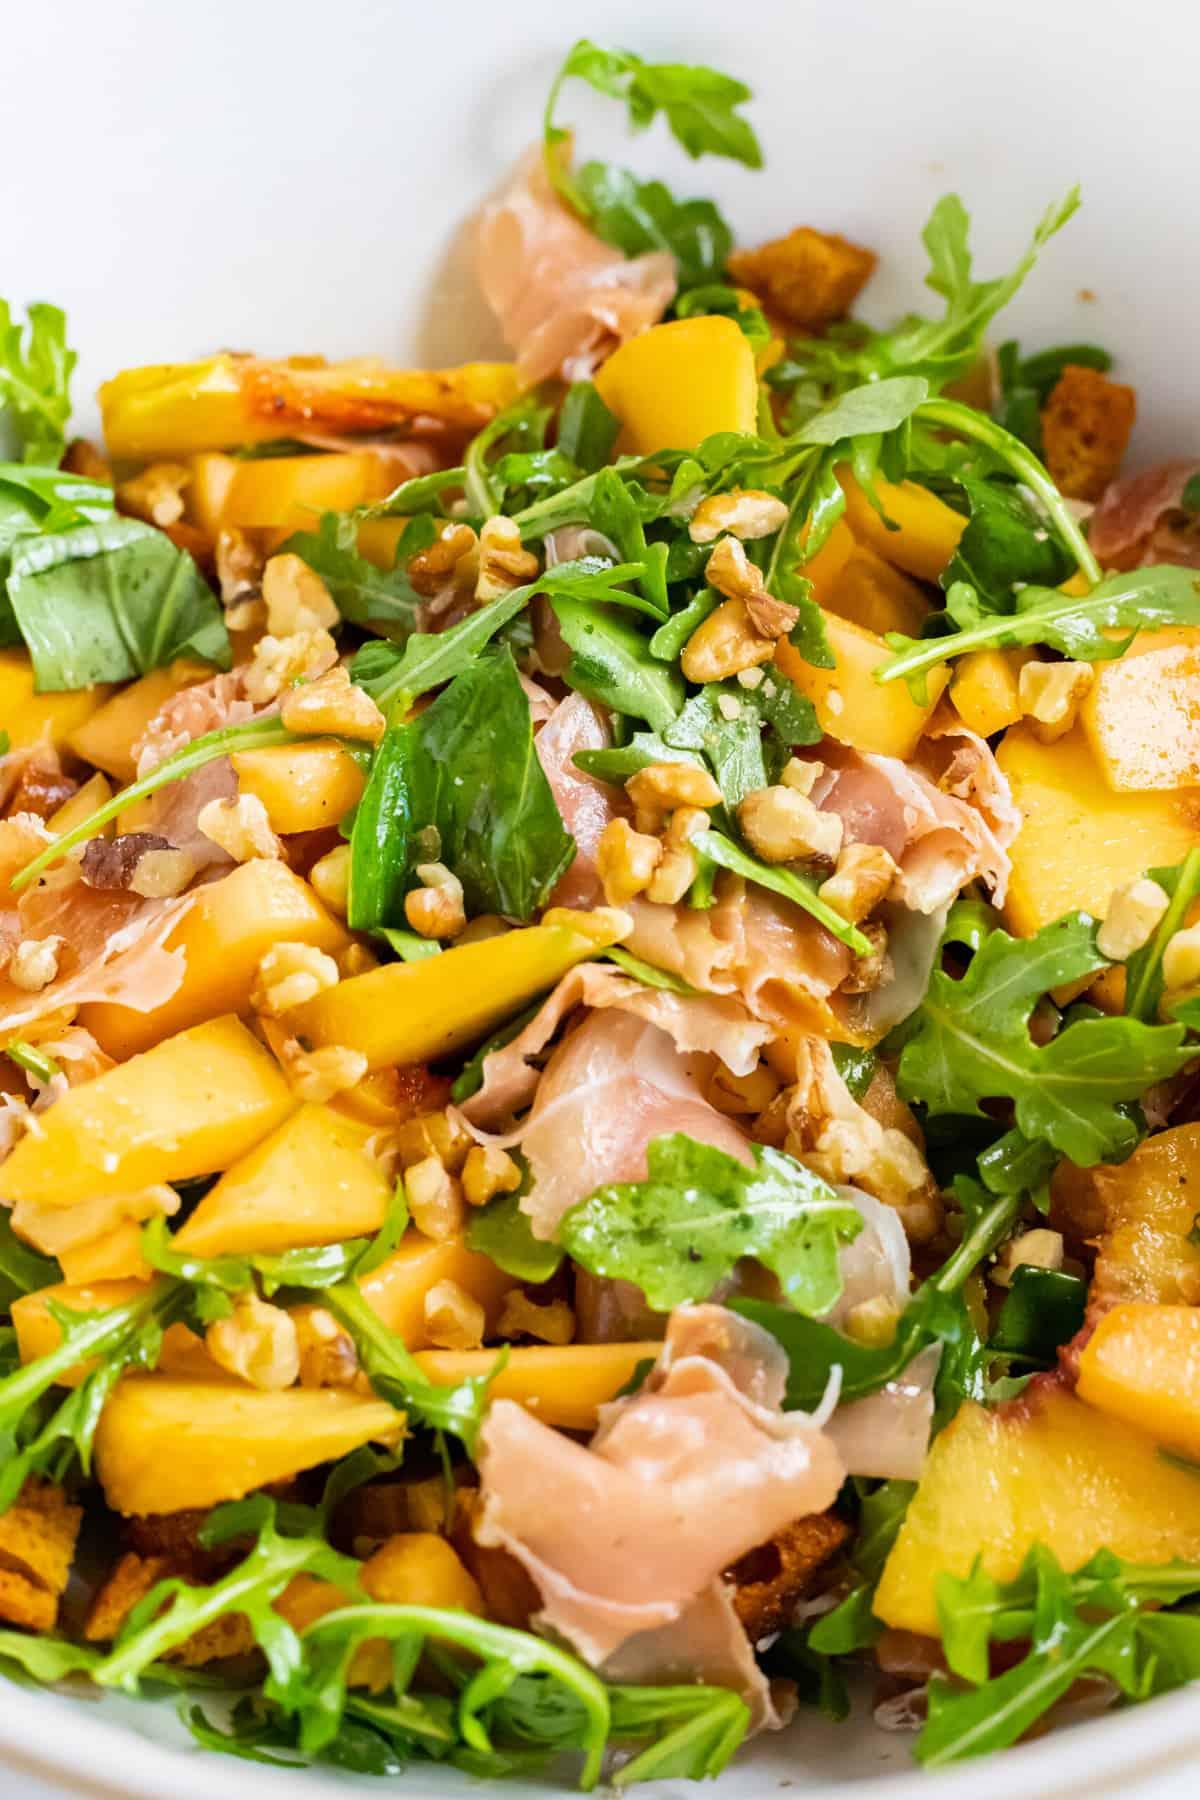 a fresh summer salad of prosciutto, peaches, melon, walnuts, croutons, feta, and arugula